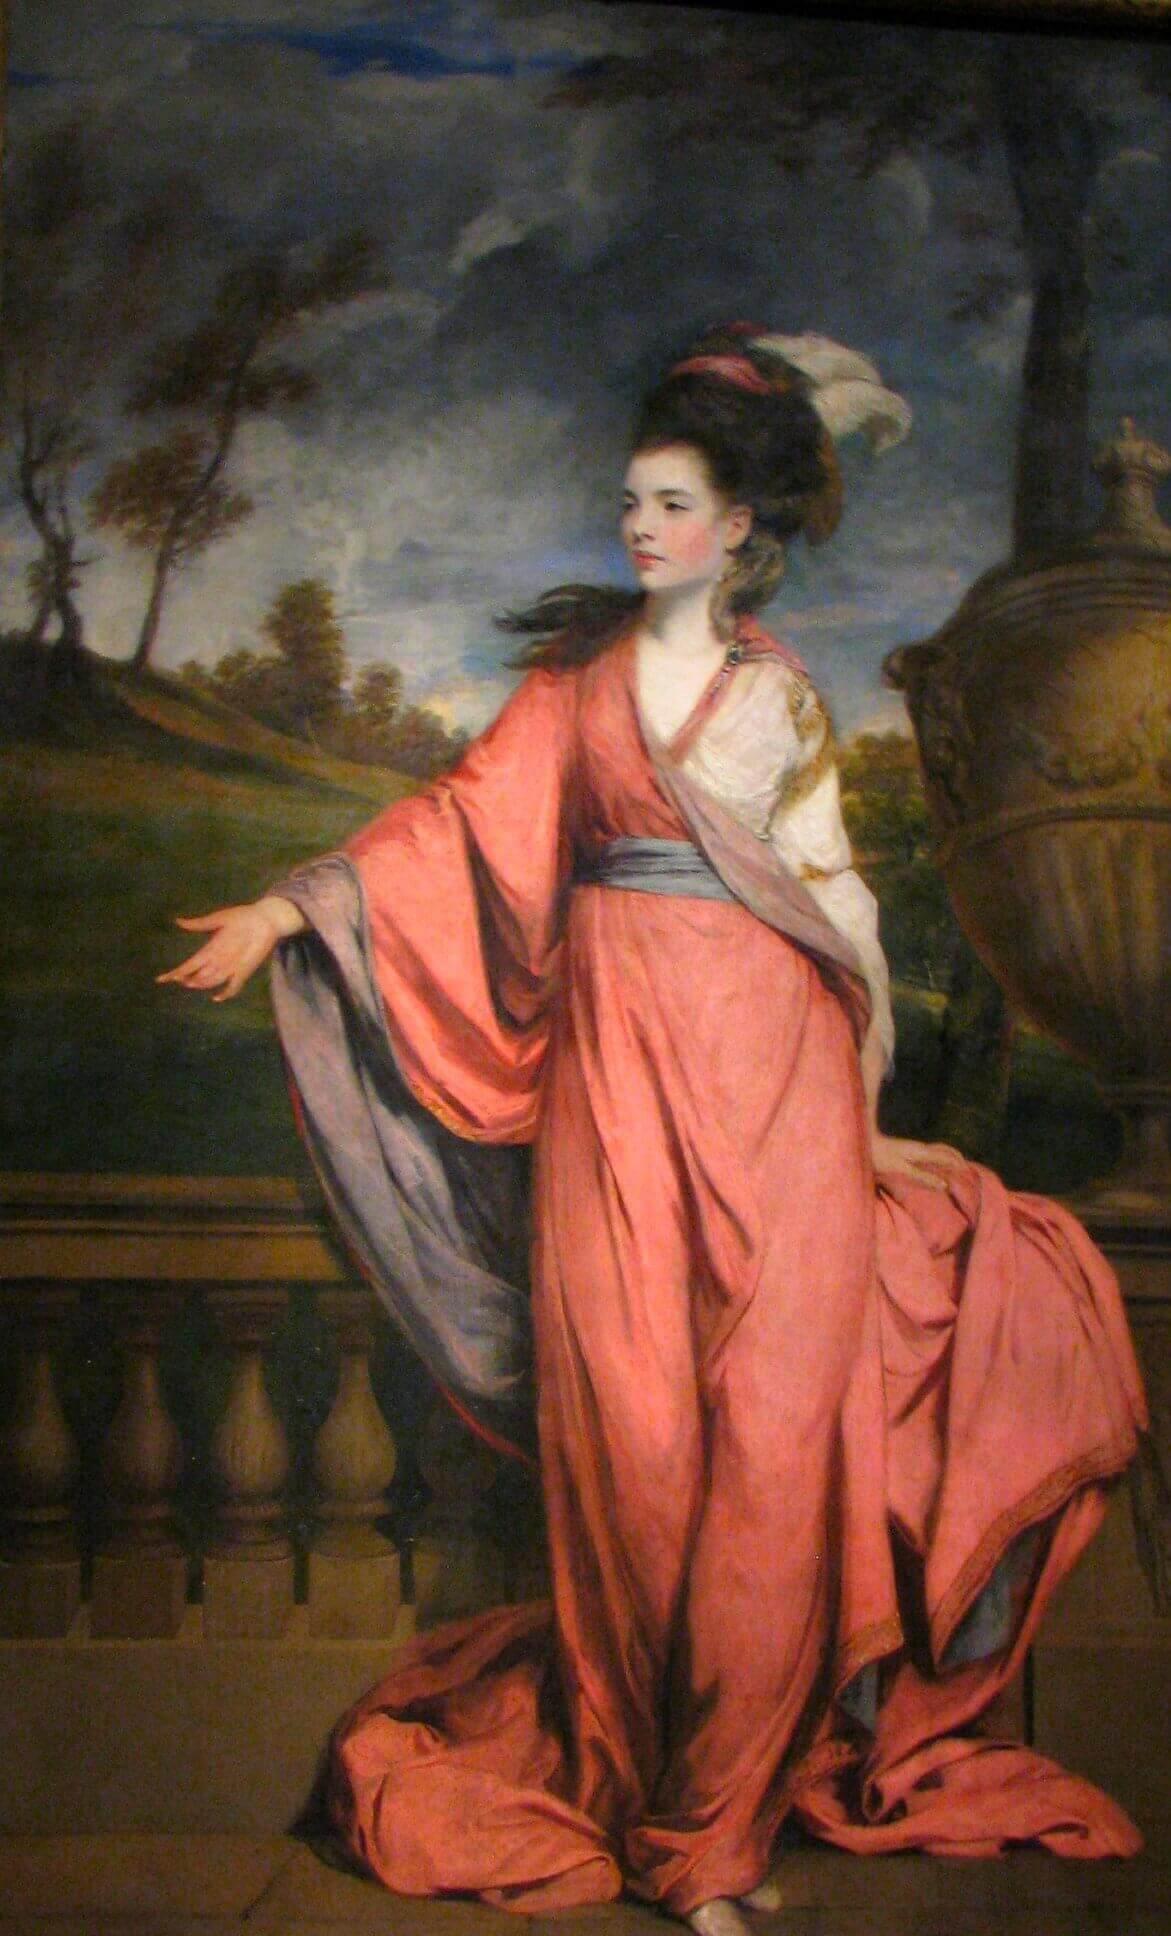 Joshua Reynolds. Countess of Harrington. 1779.